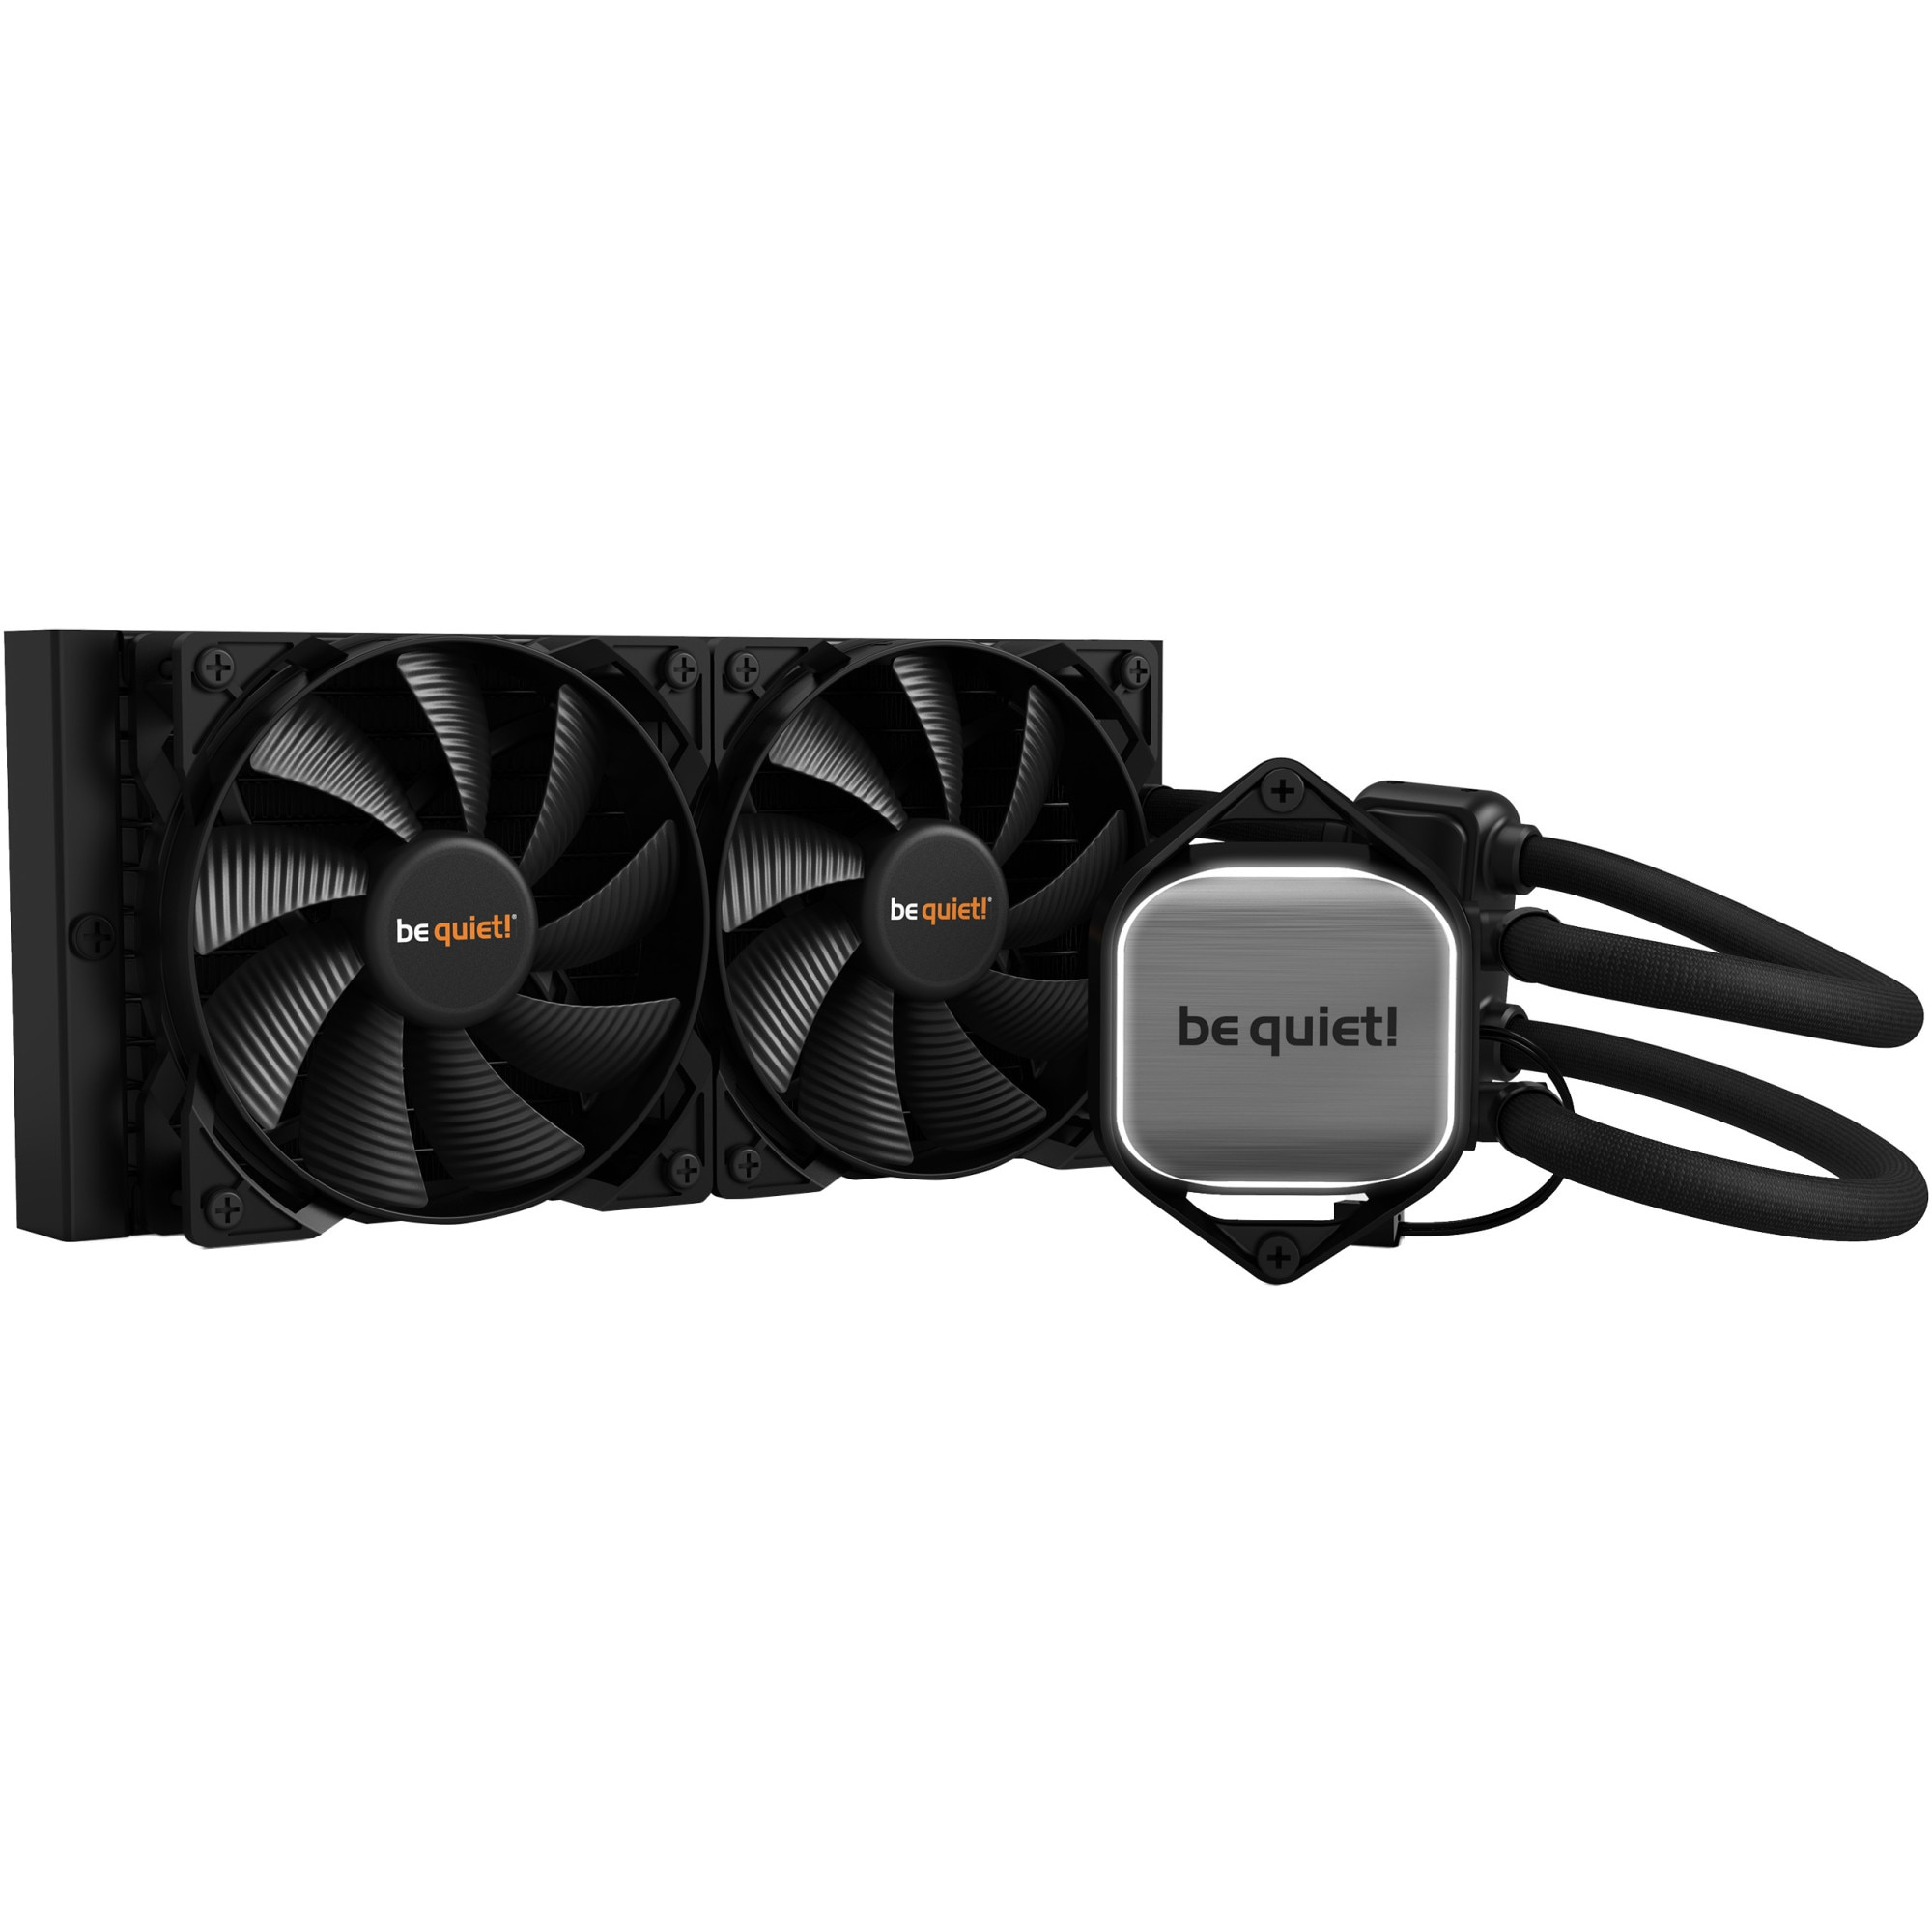 Fotografie Cooler Procesor be quiet! Pure Loop 240, compatibil AMD/Intel